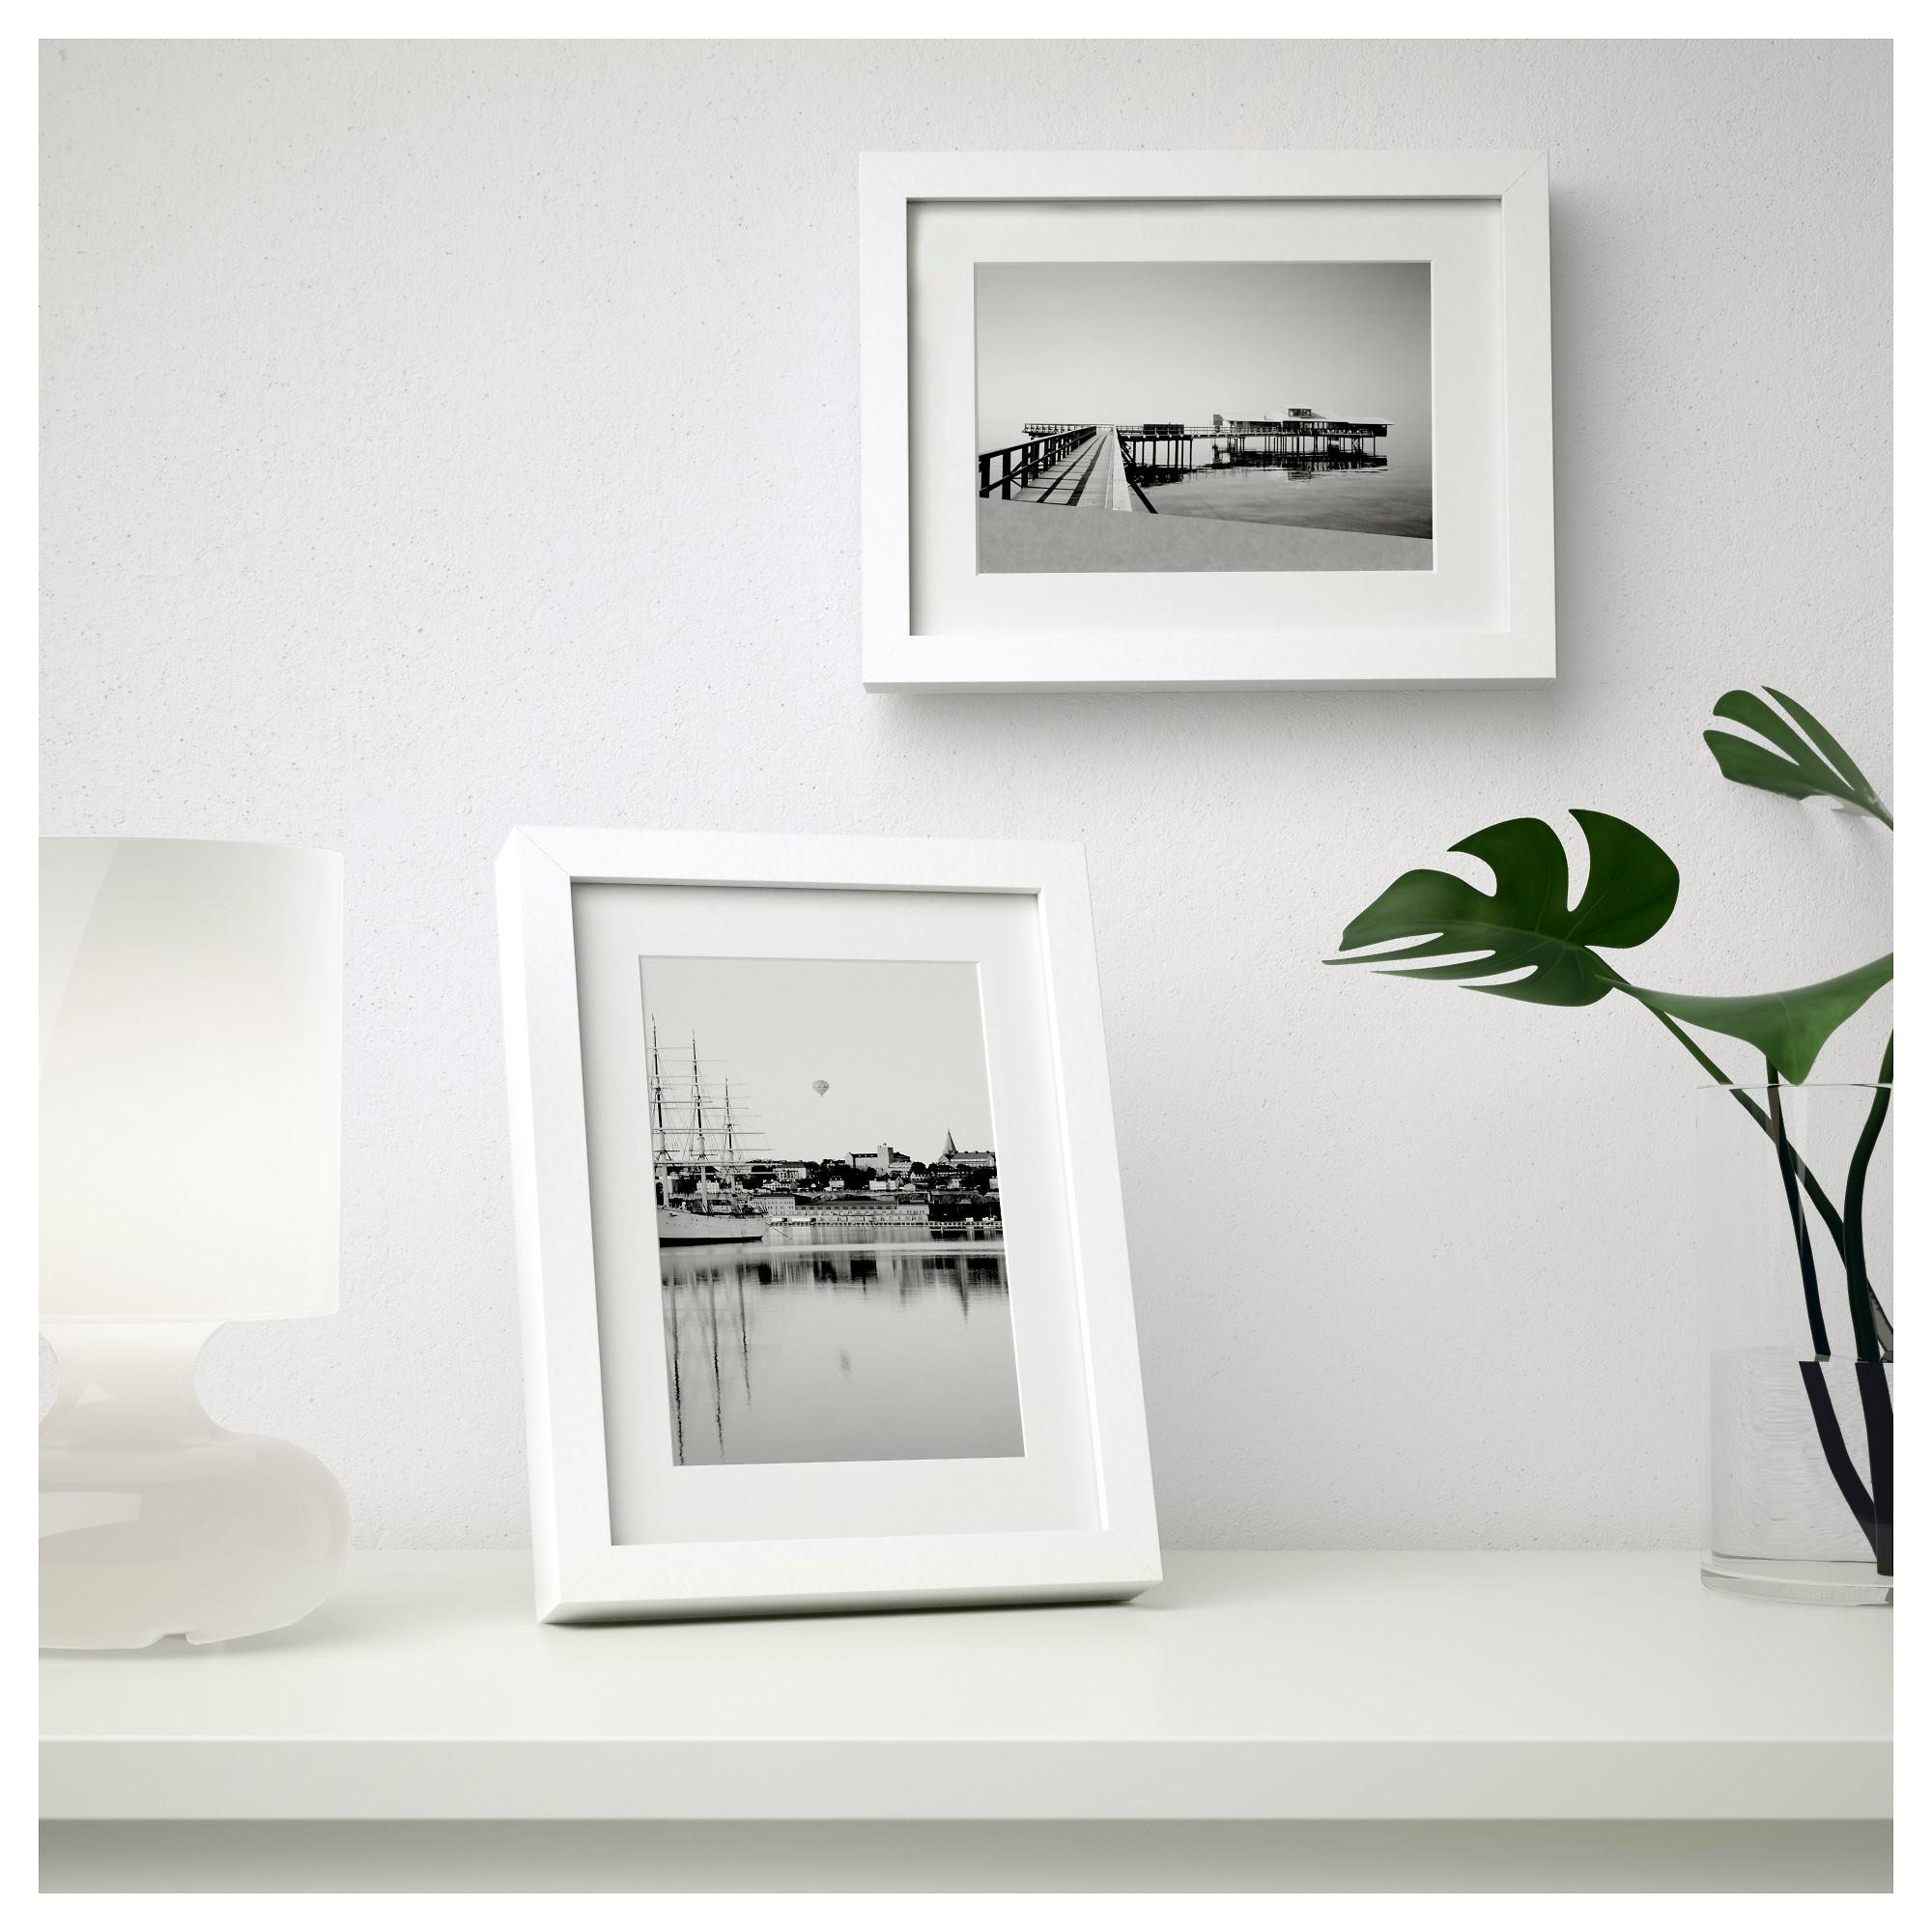 Fine Ikea Ribba Frames Vignette - Picture Frame Ideas ...